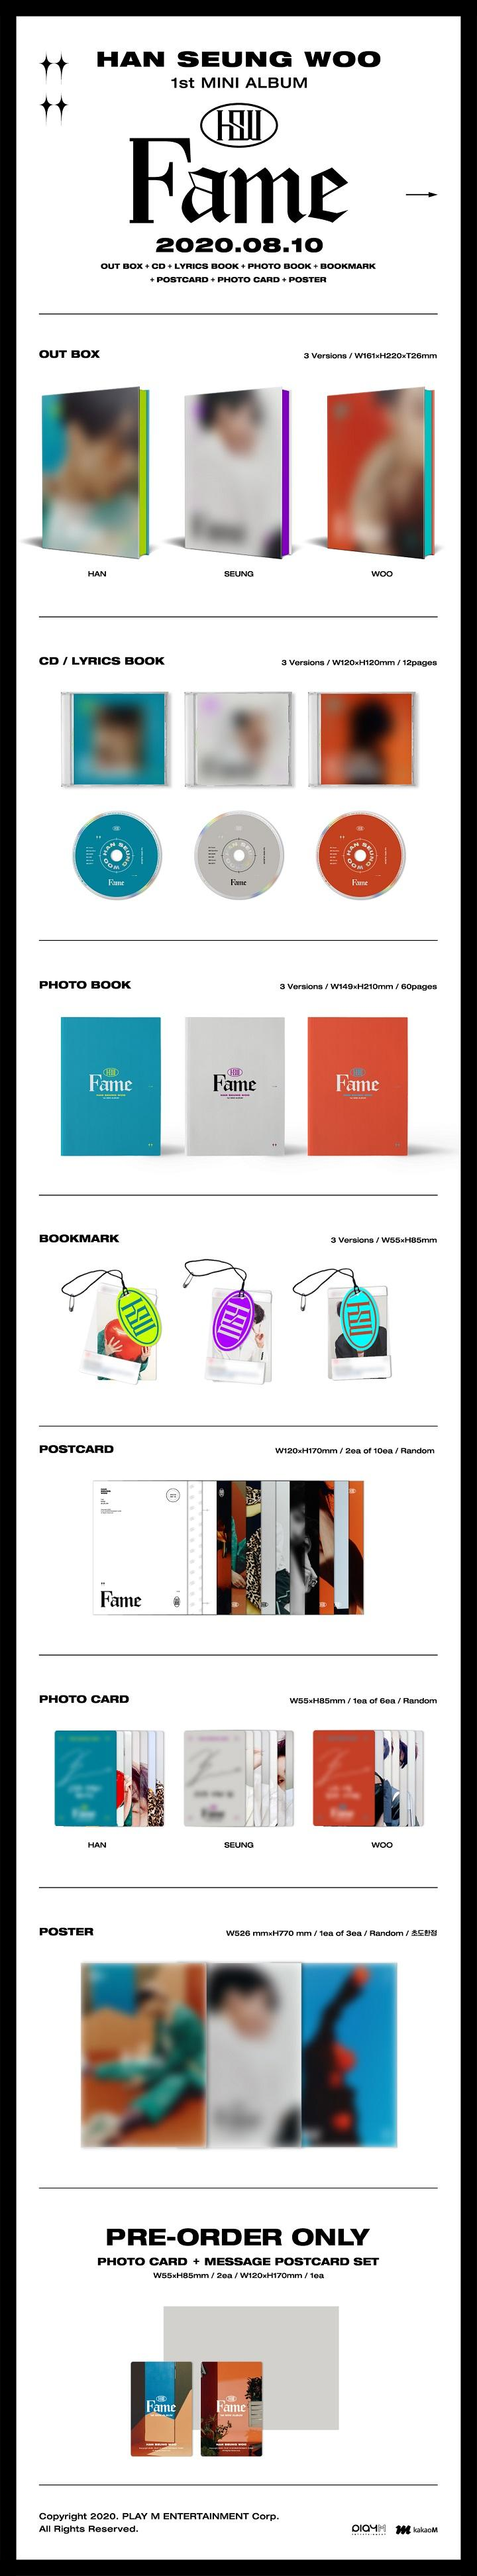 HAN SEUNG WOO -1st Mini [Fame] (WOO ver.) + Poster